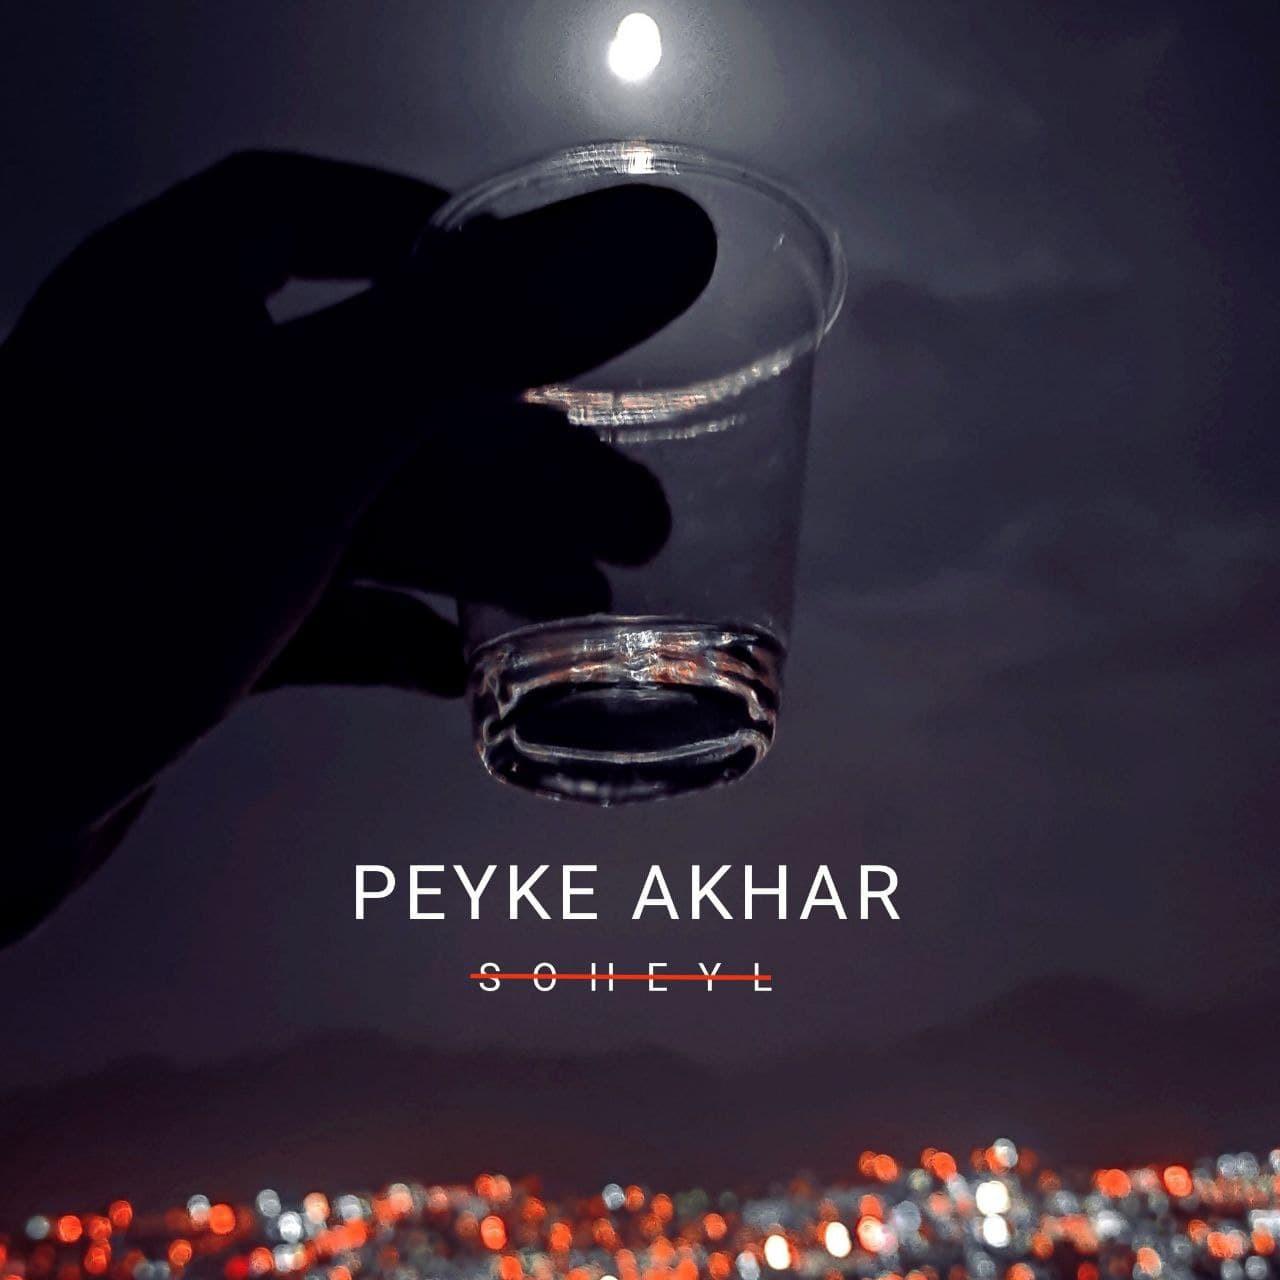 Soheyl - Peyke Akhar